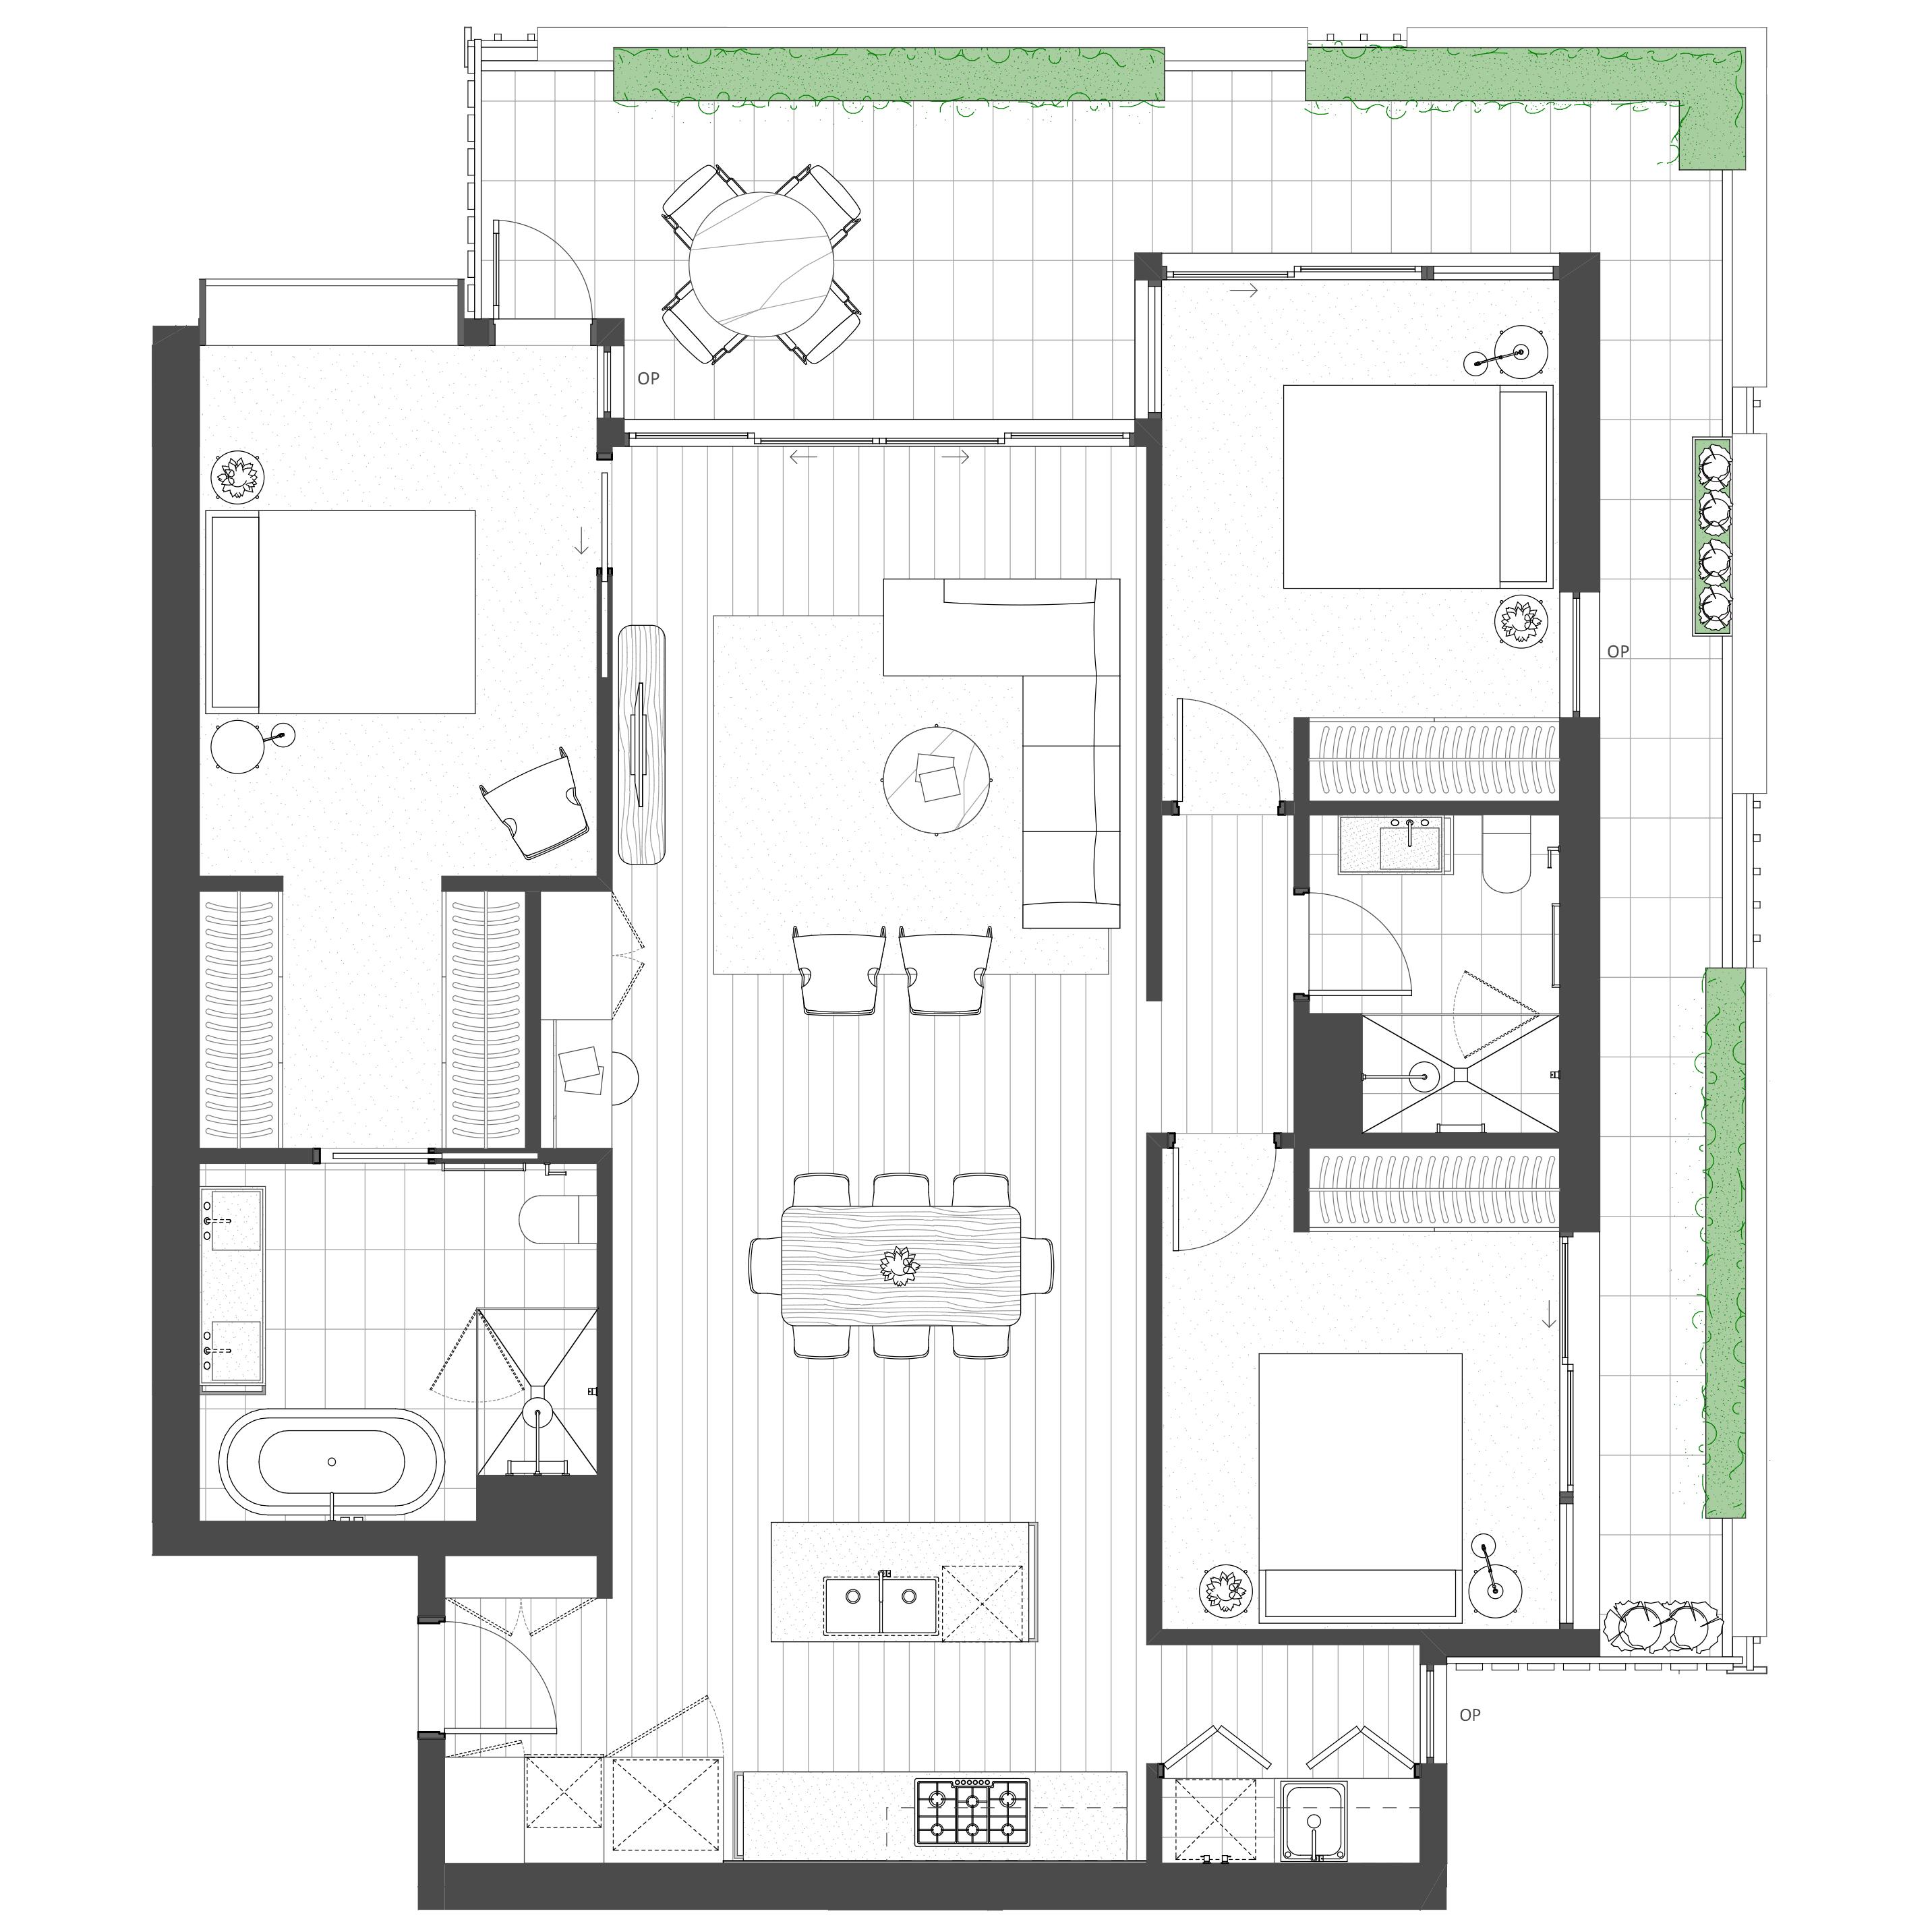 3 Bedroom, 2 Bathroom, 2 Carpark